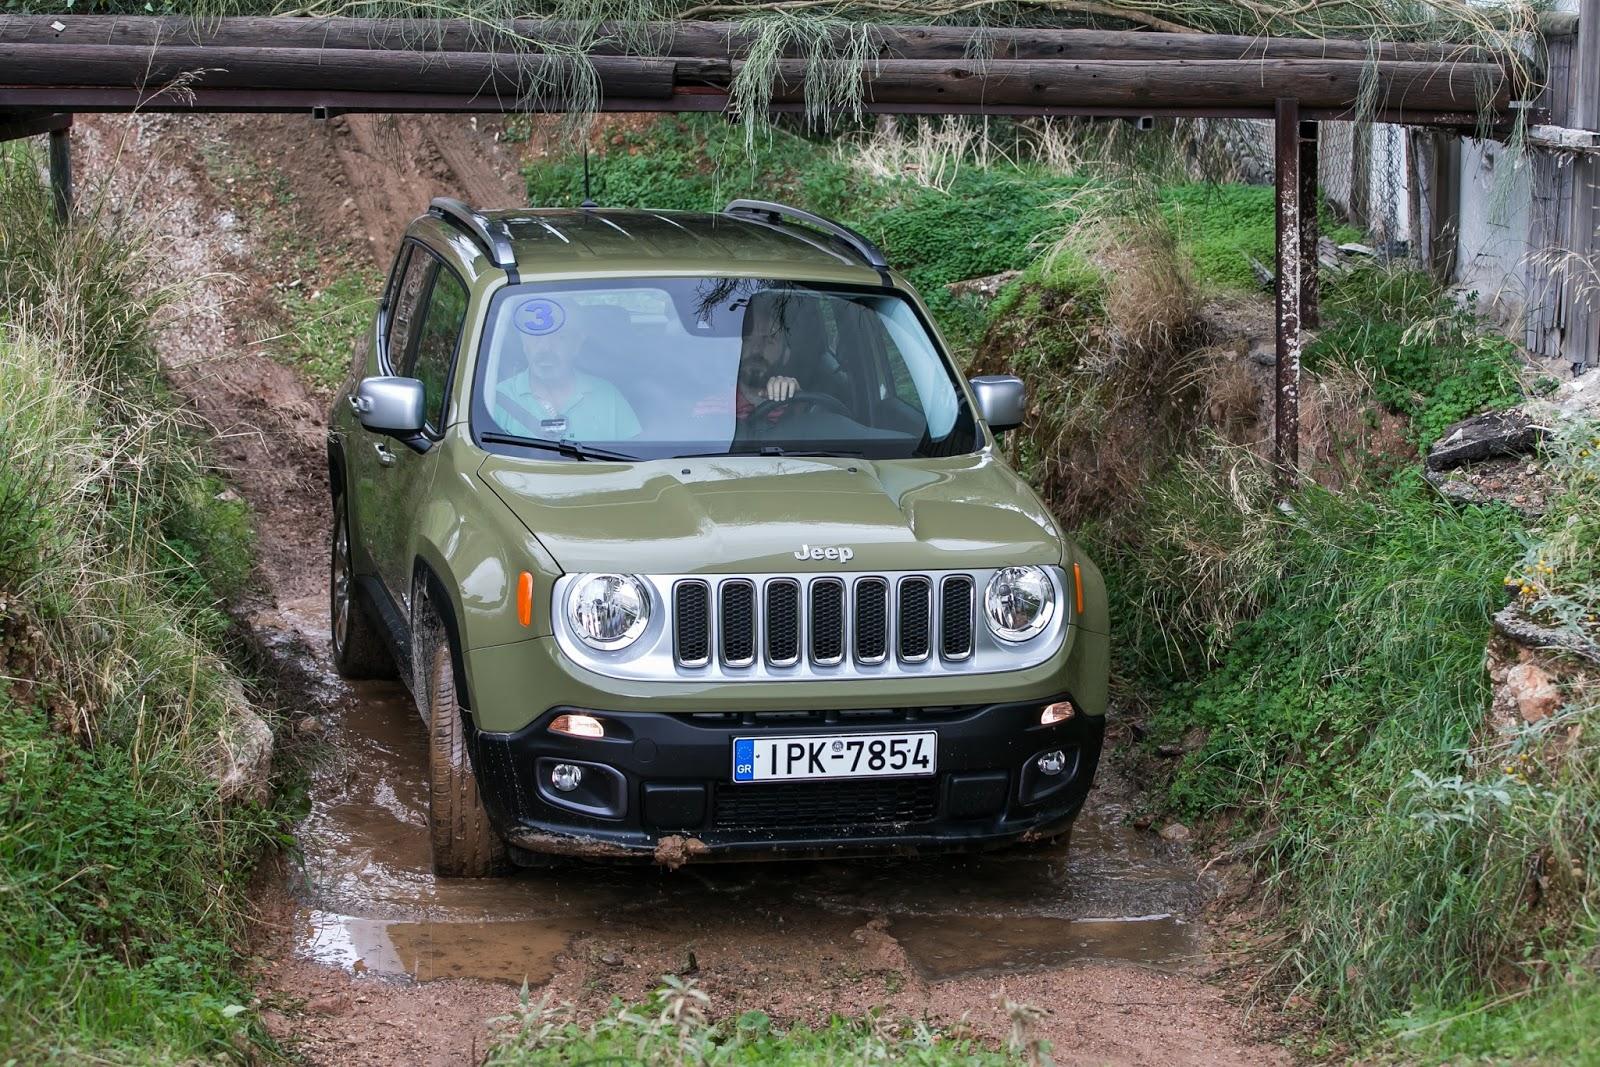 KF 1545 Πετάμε ένα Jeep Renegade σε λάσπες, πέτρες, άμμο, λίμνες. Θα τα καταφέρει;